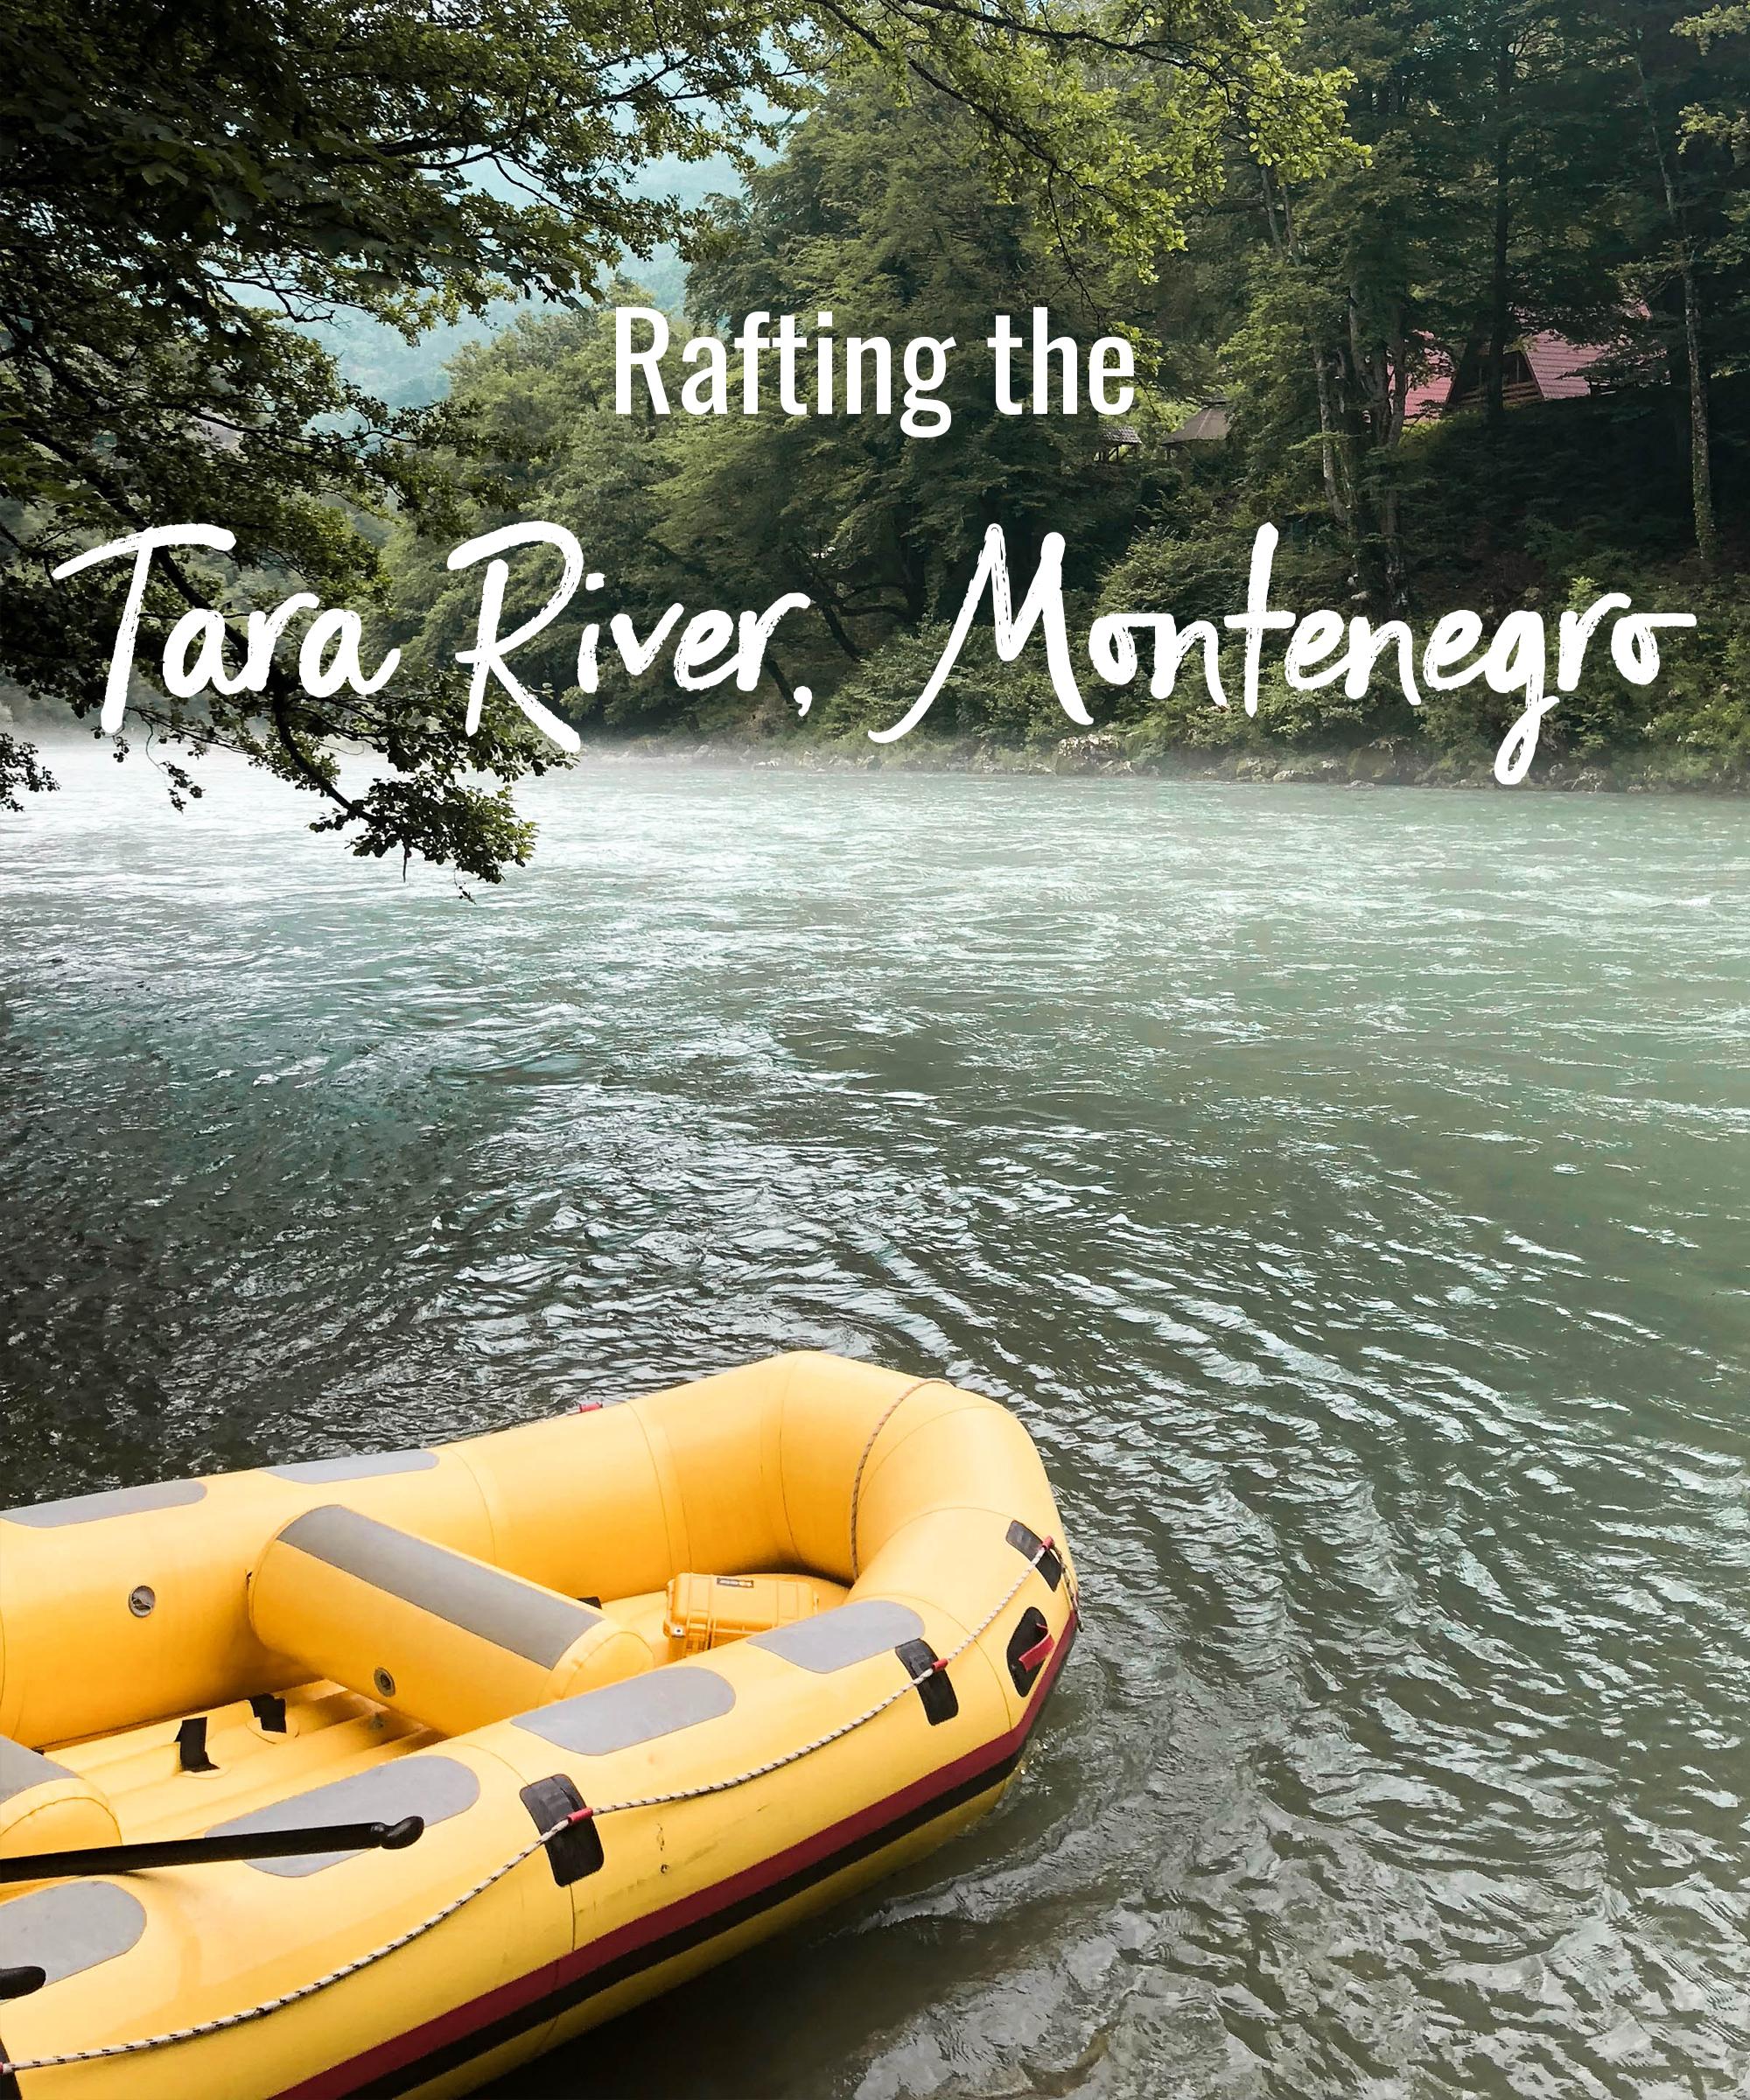 Rafting the Tara River, Montenegro